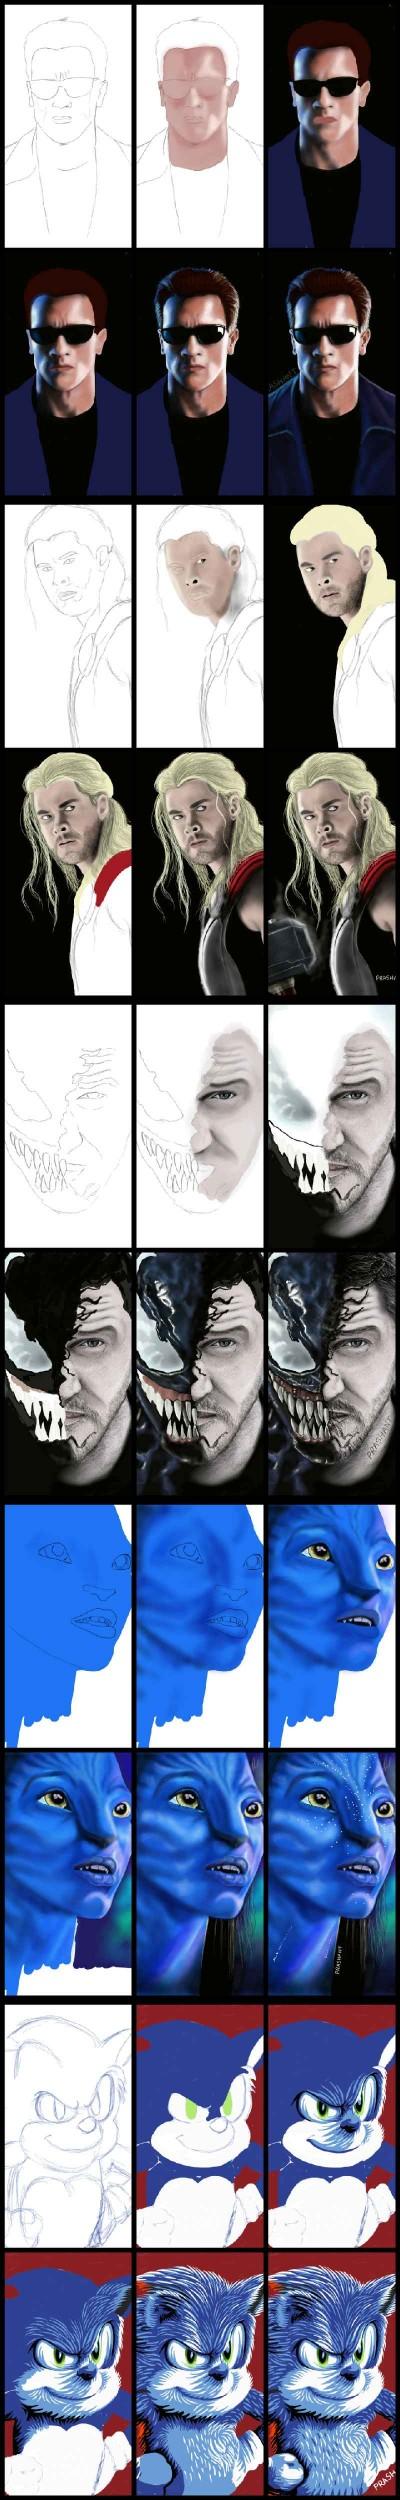 Work in progress in live drawing! | Prashant | Digital Drawing | PENUP